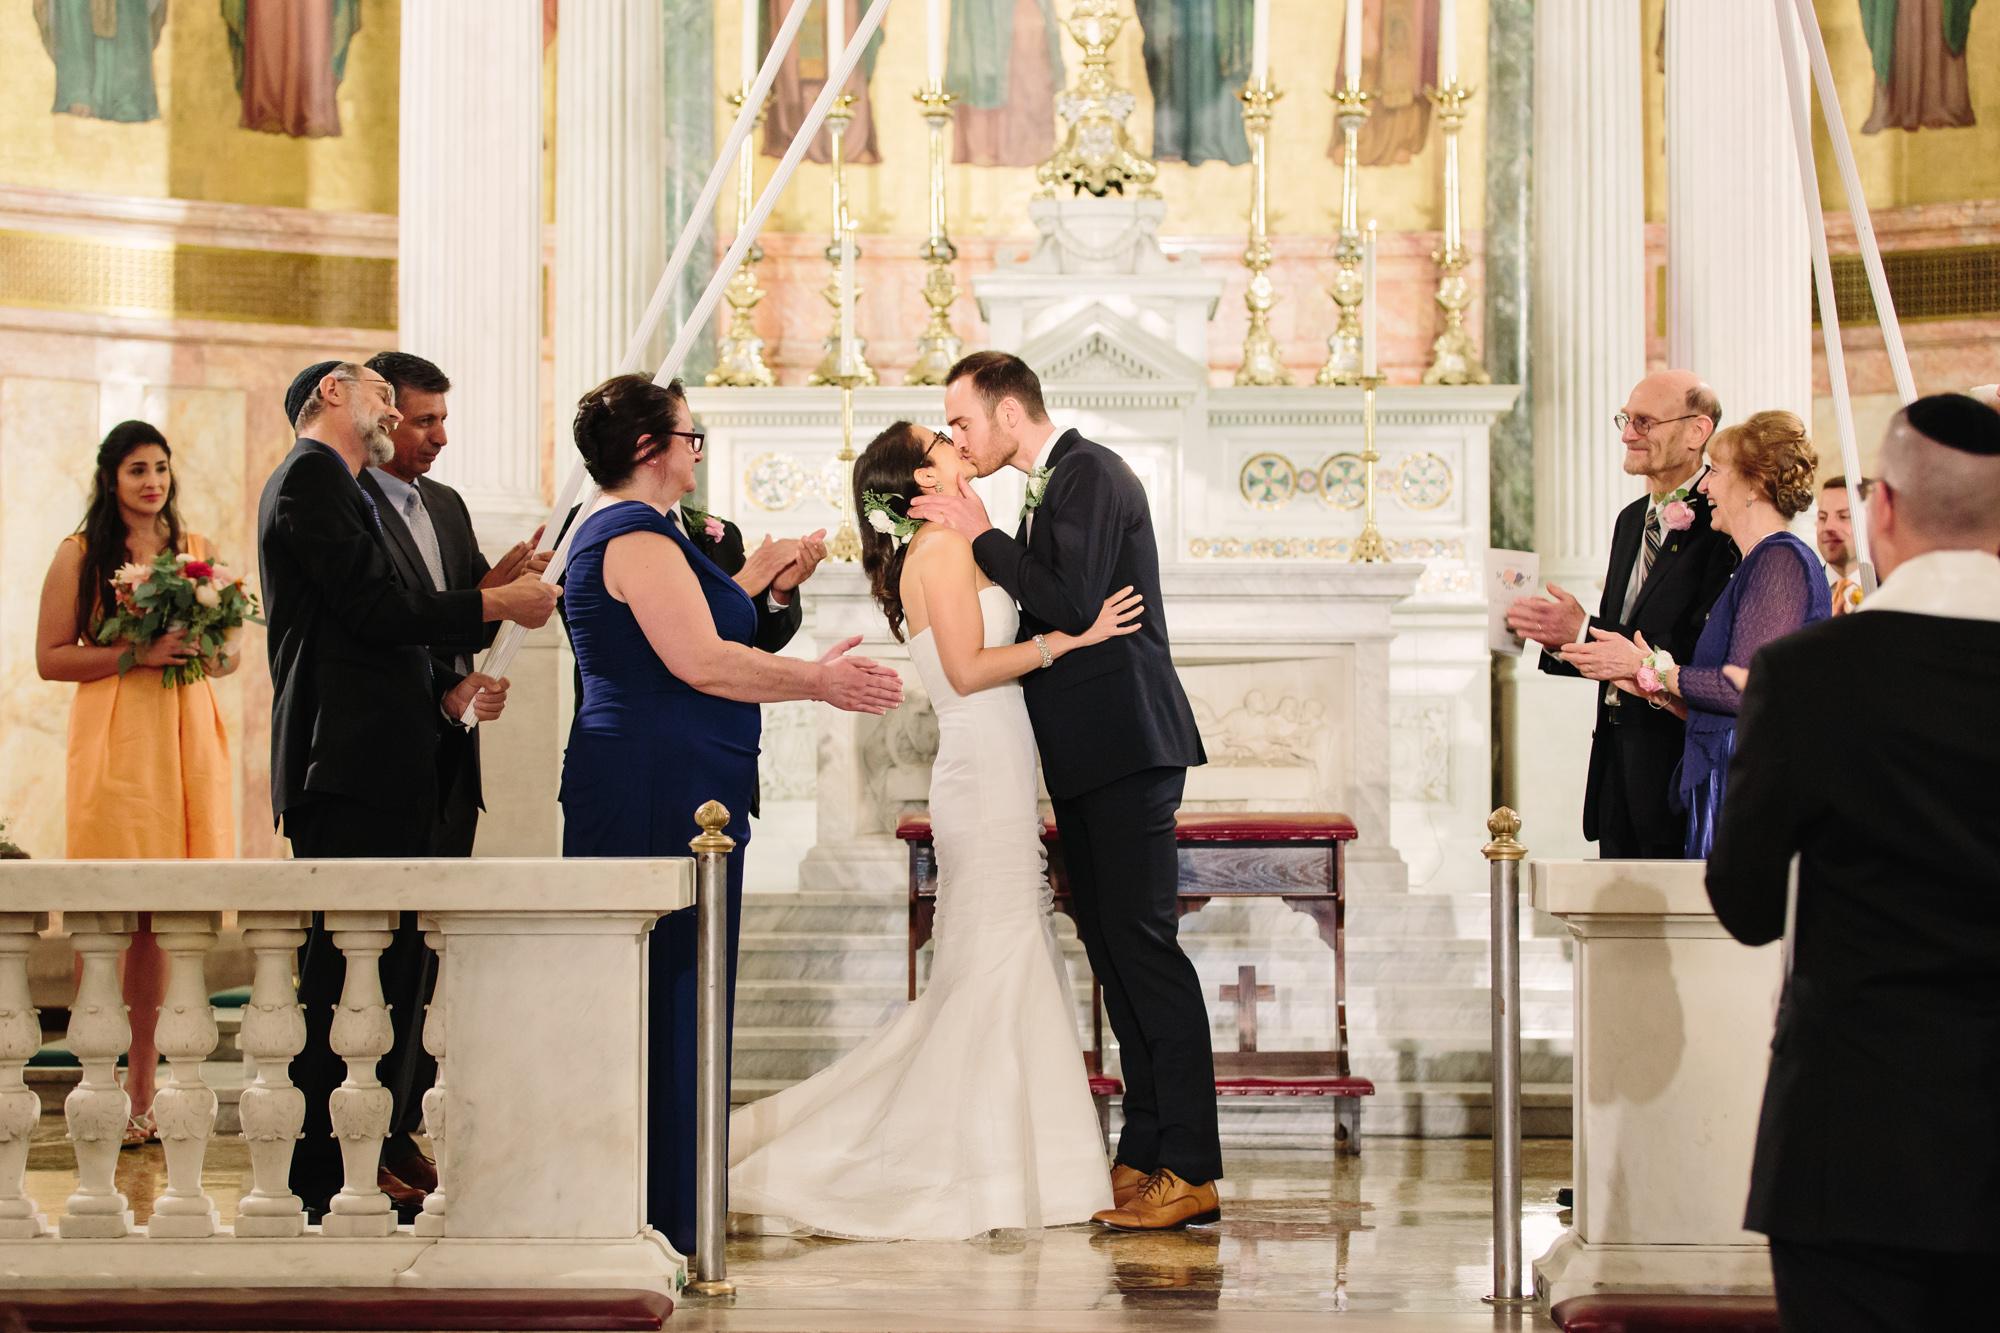 22_Kate_Sam_Picnic_House_Wedding_Brooklyn_NY_Tanya_Salazar_Photography_635.jpg